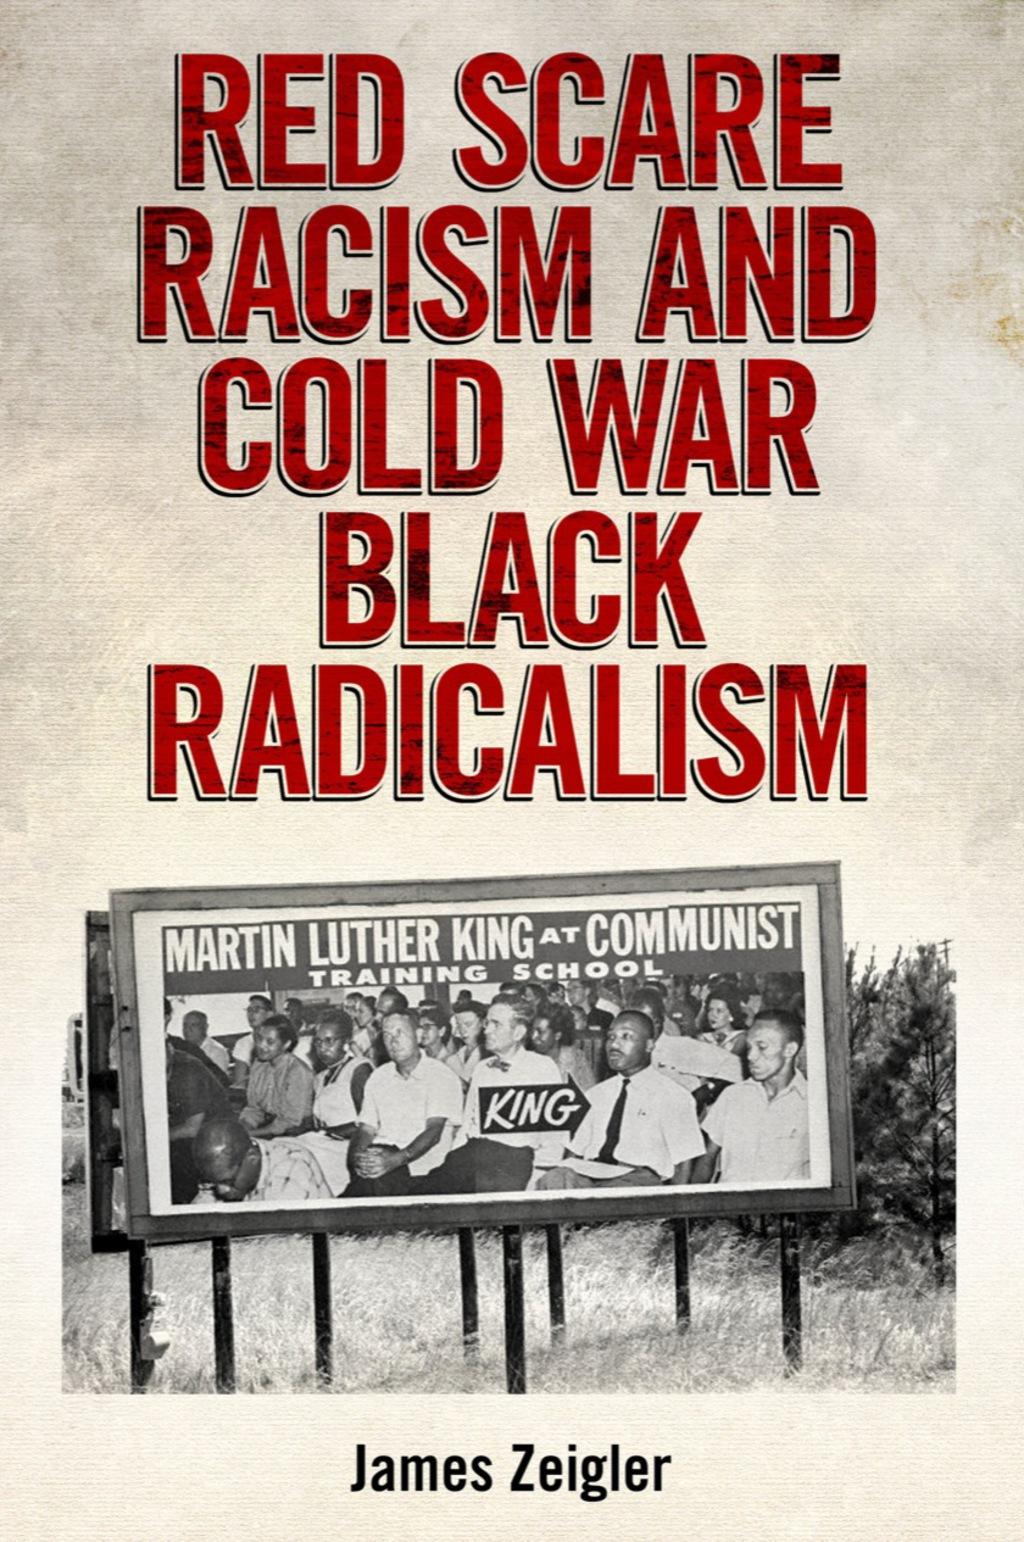 Red Scare Racism and Cold War Black Radicalism (eBook)